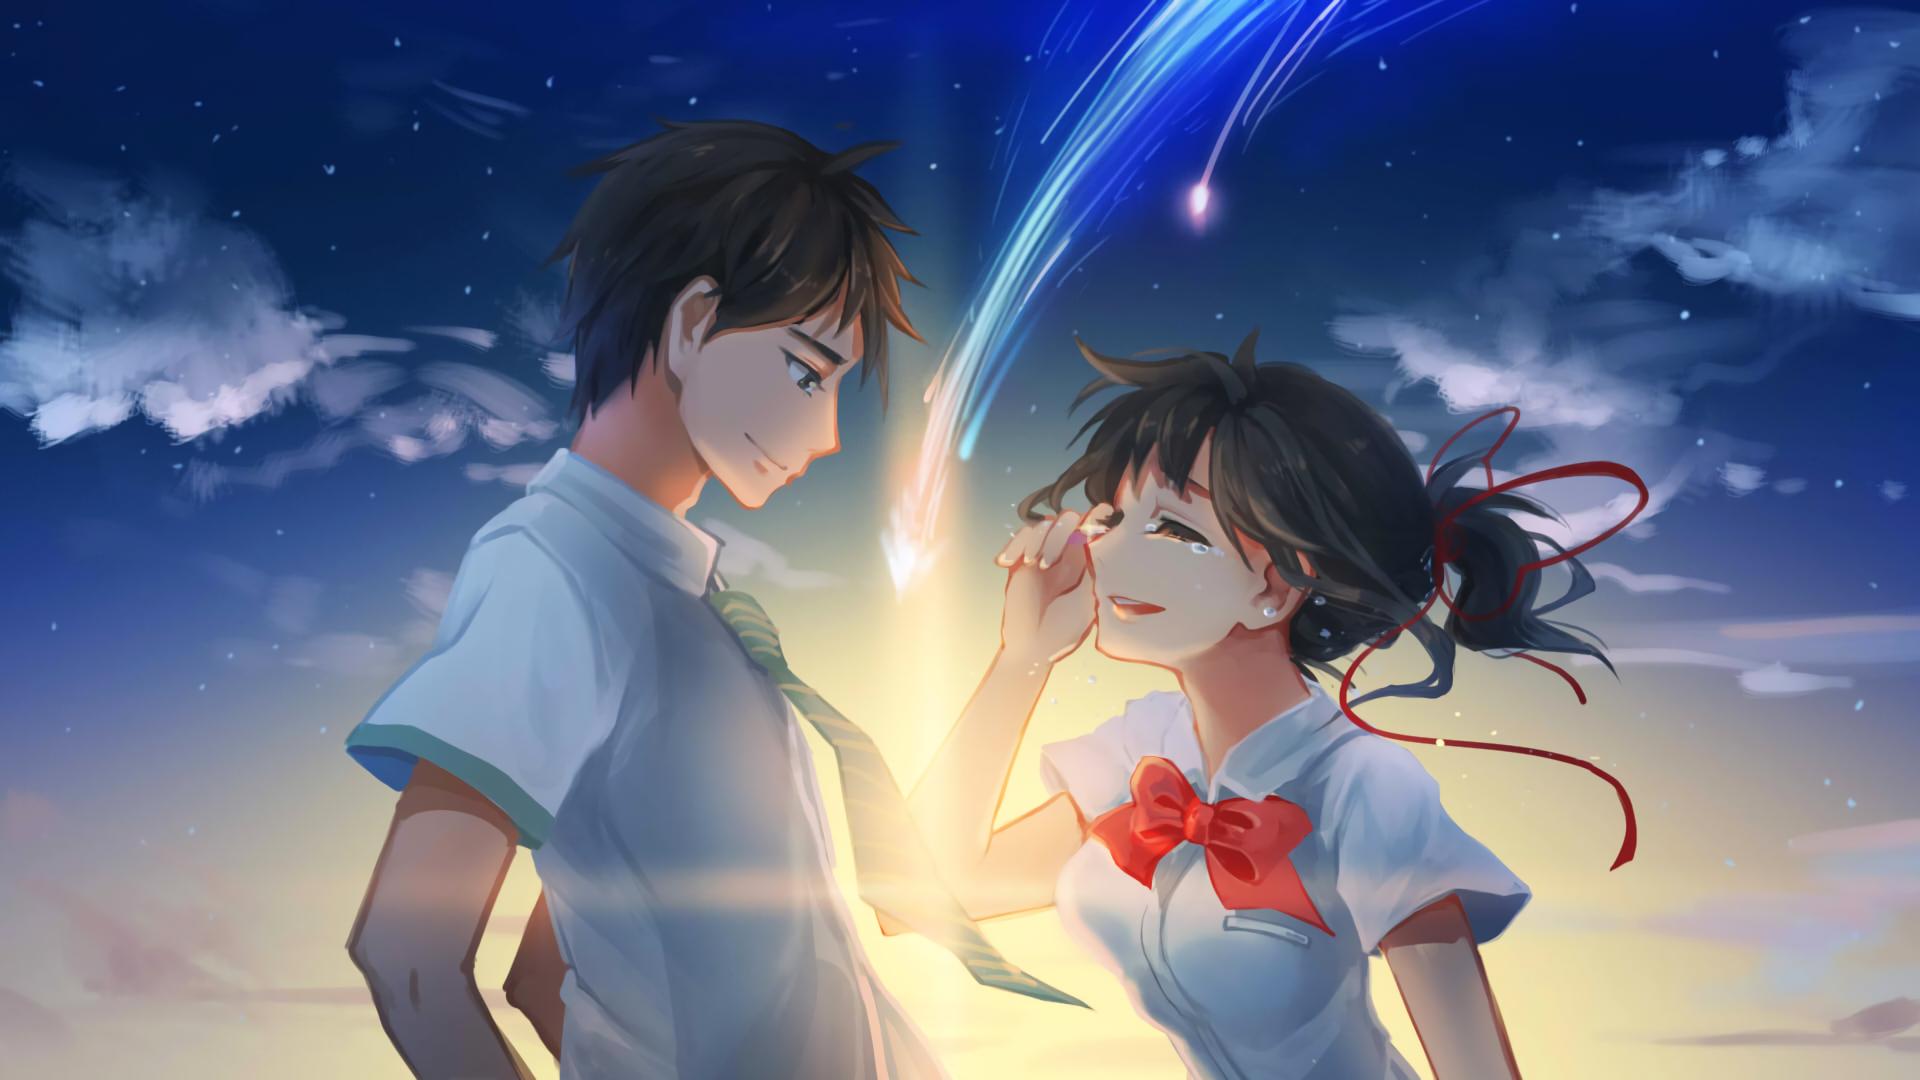 Anime Your Name Mitsuha Miyamizu Taki Tachibana Kimi No Na